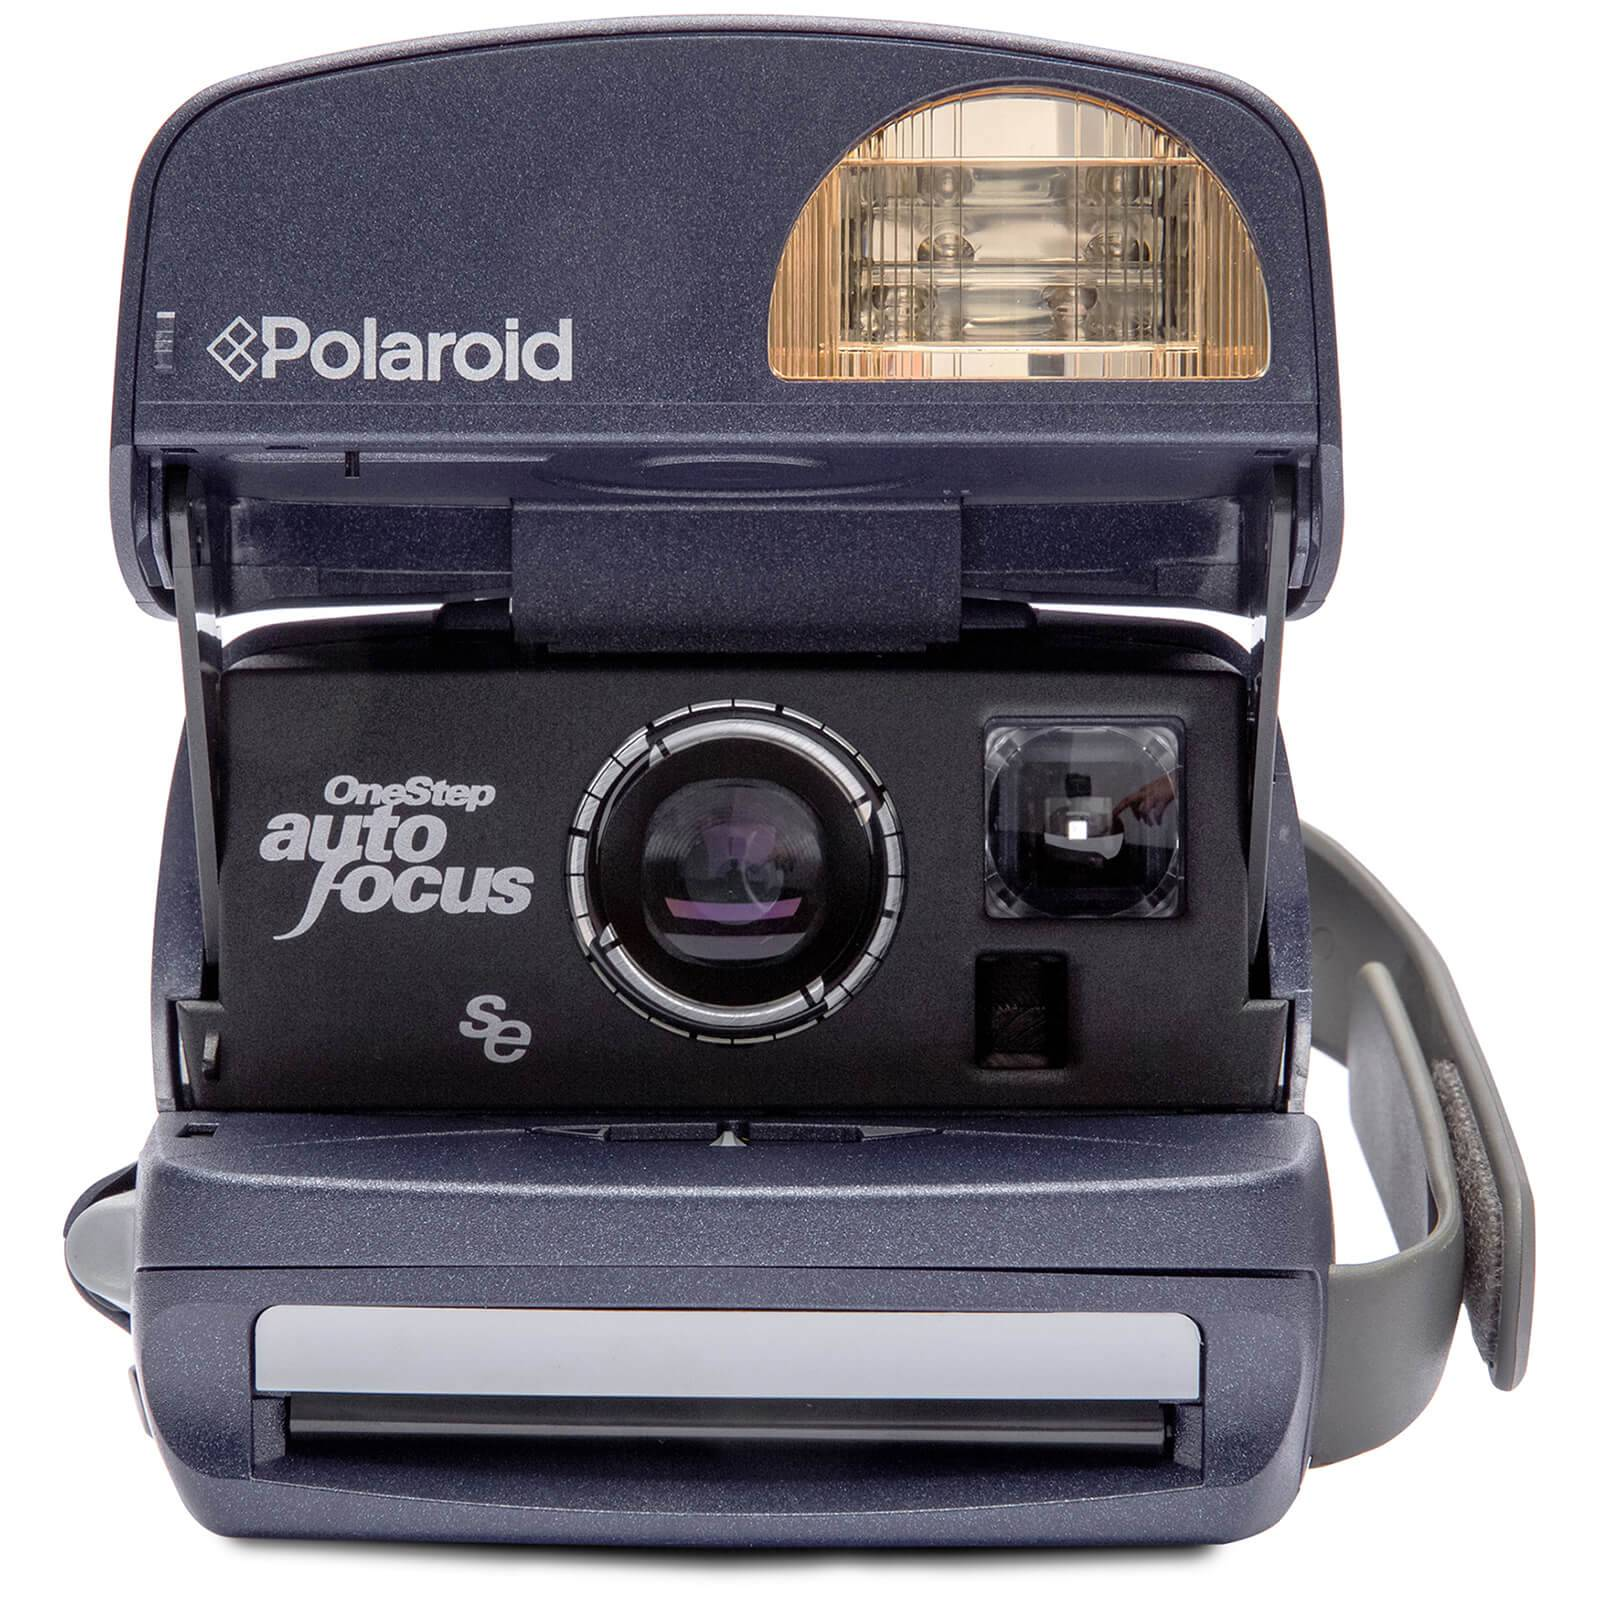 Polaroid 600 Camera - Round - Vintage Refurb - Grade A-